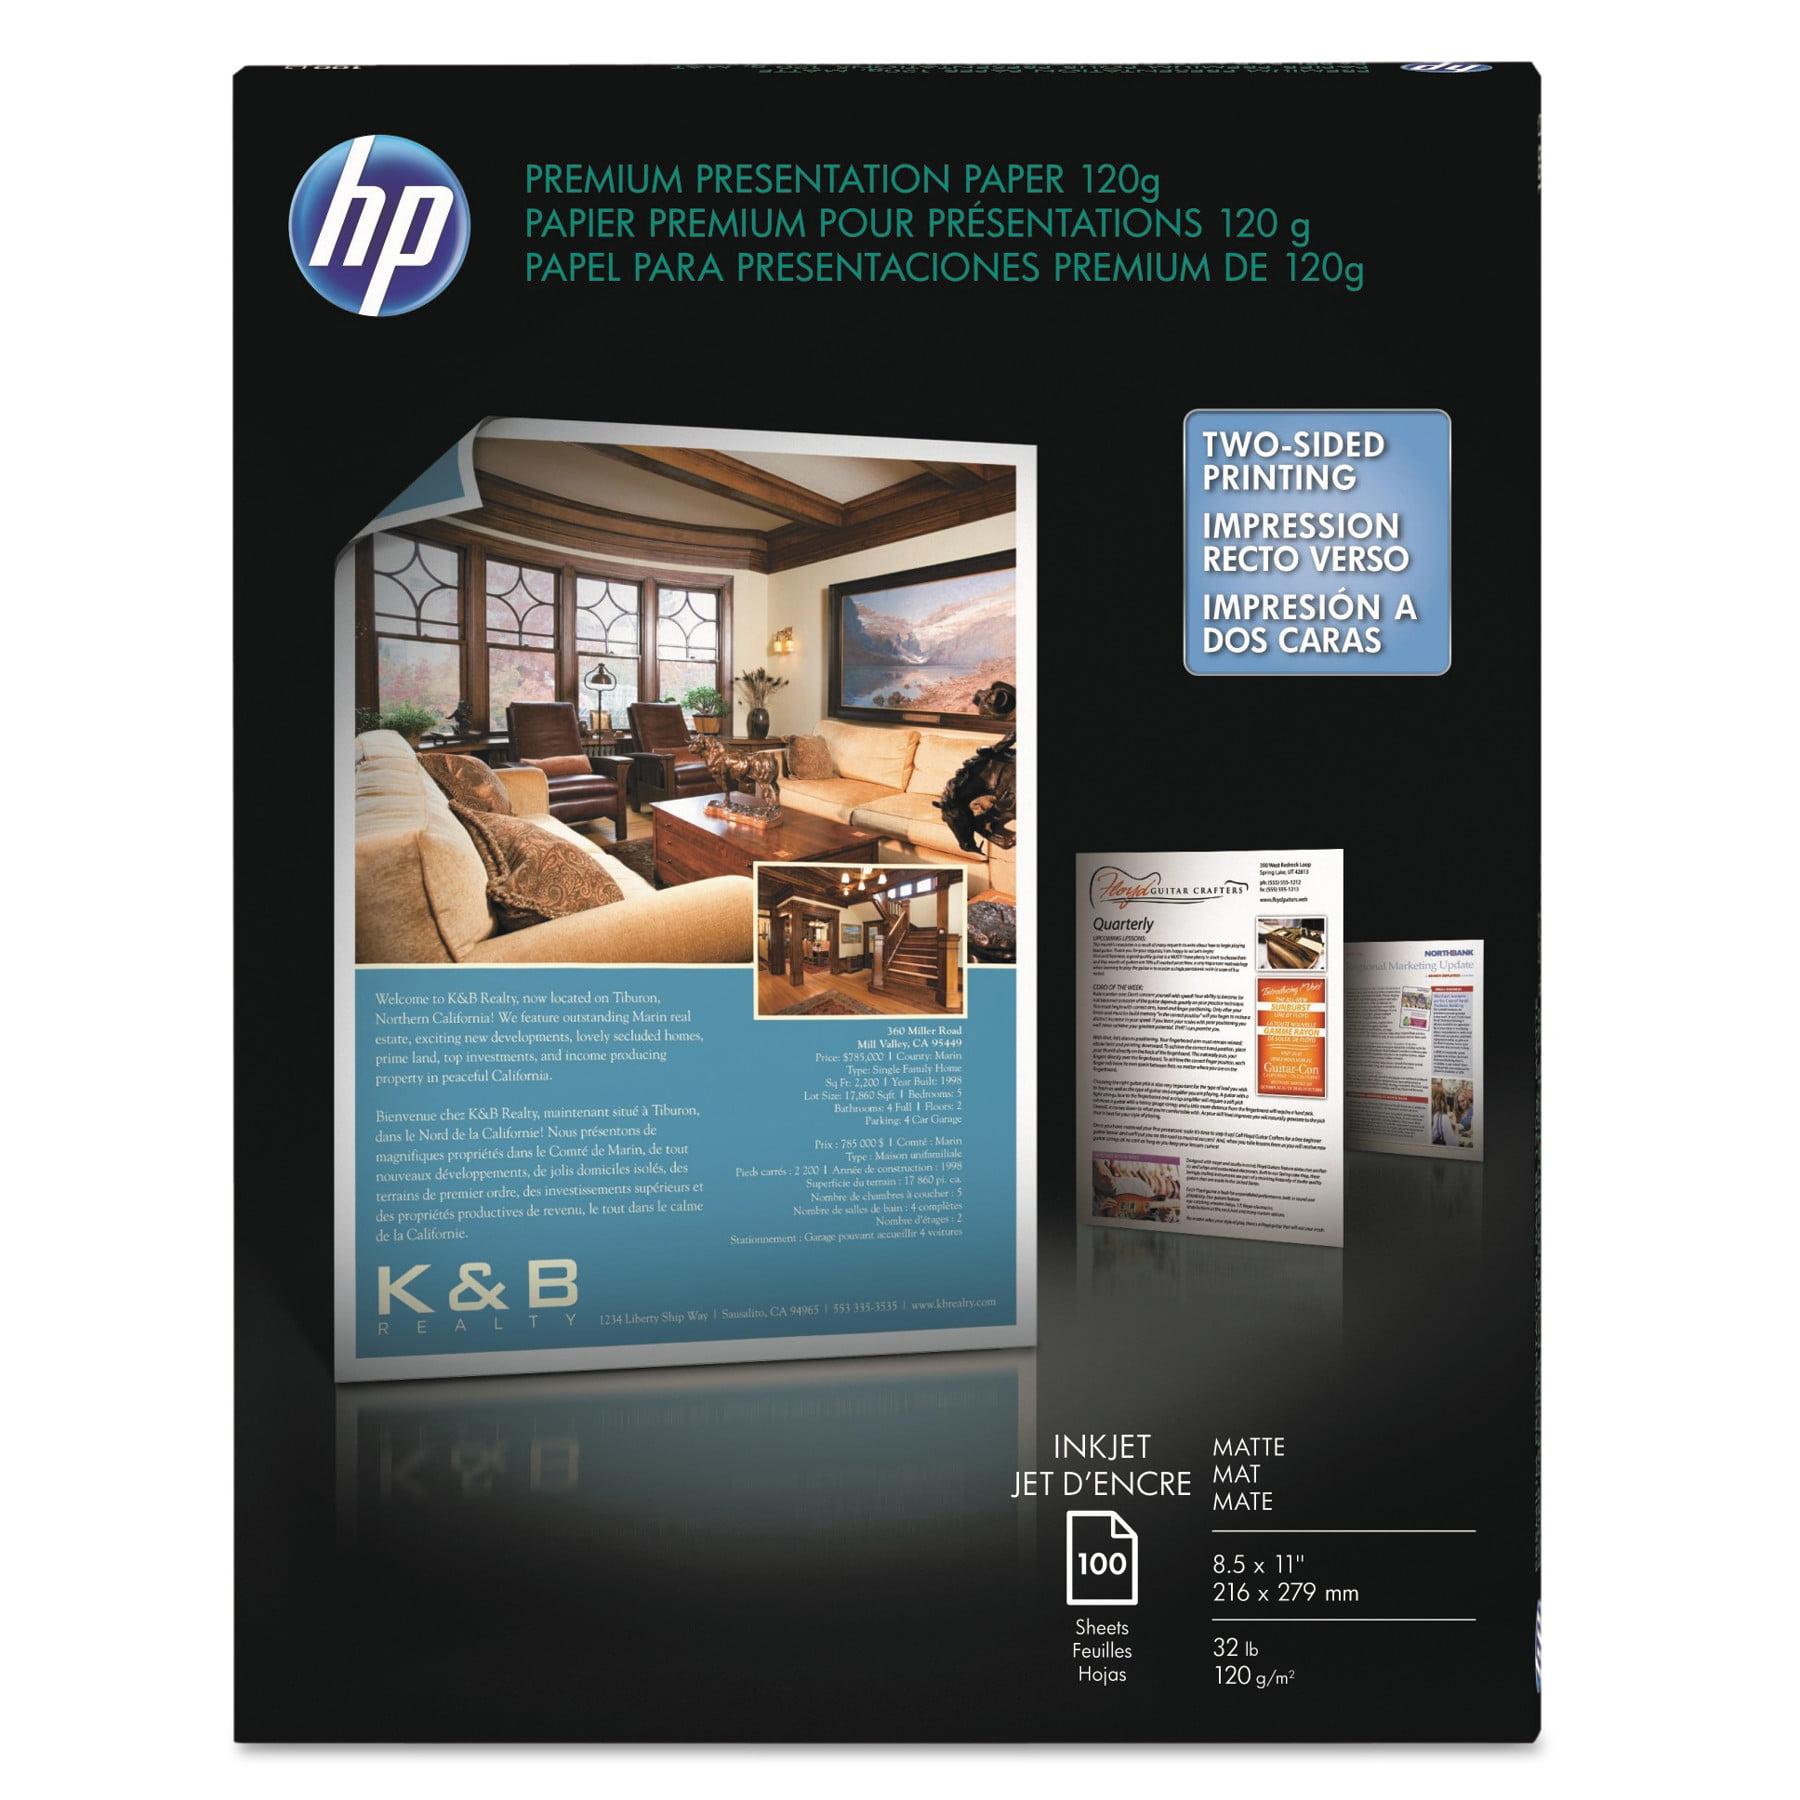 HP Premium Inkjet Matte Presentation Paper, 8-1/2 x 11, White, 100 Sheets/Pack -HEWD0Z55A